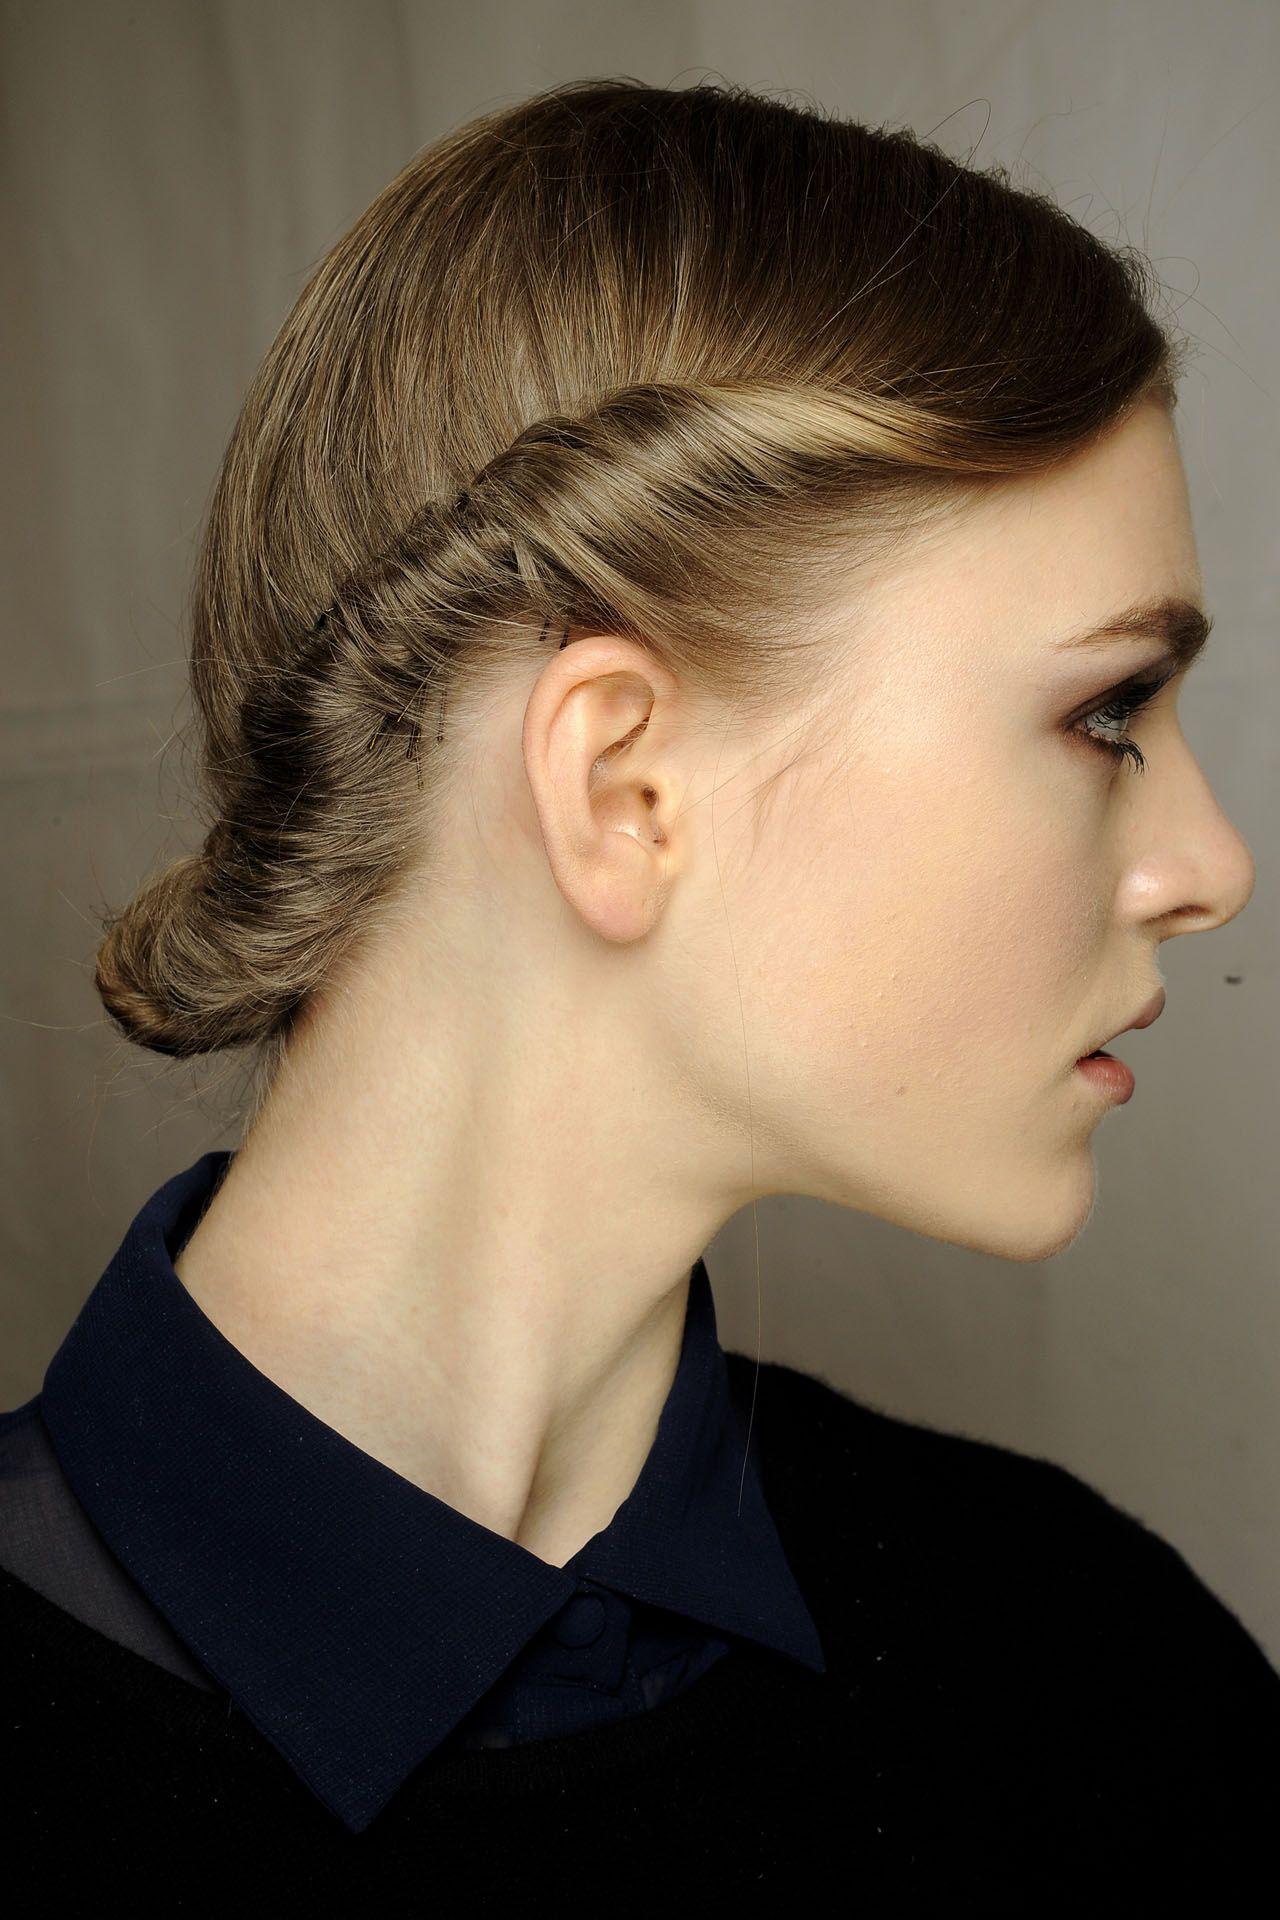 Hairstyle ideas hair hairstyle ideas pinterest easy